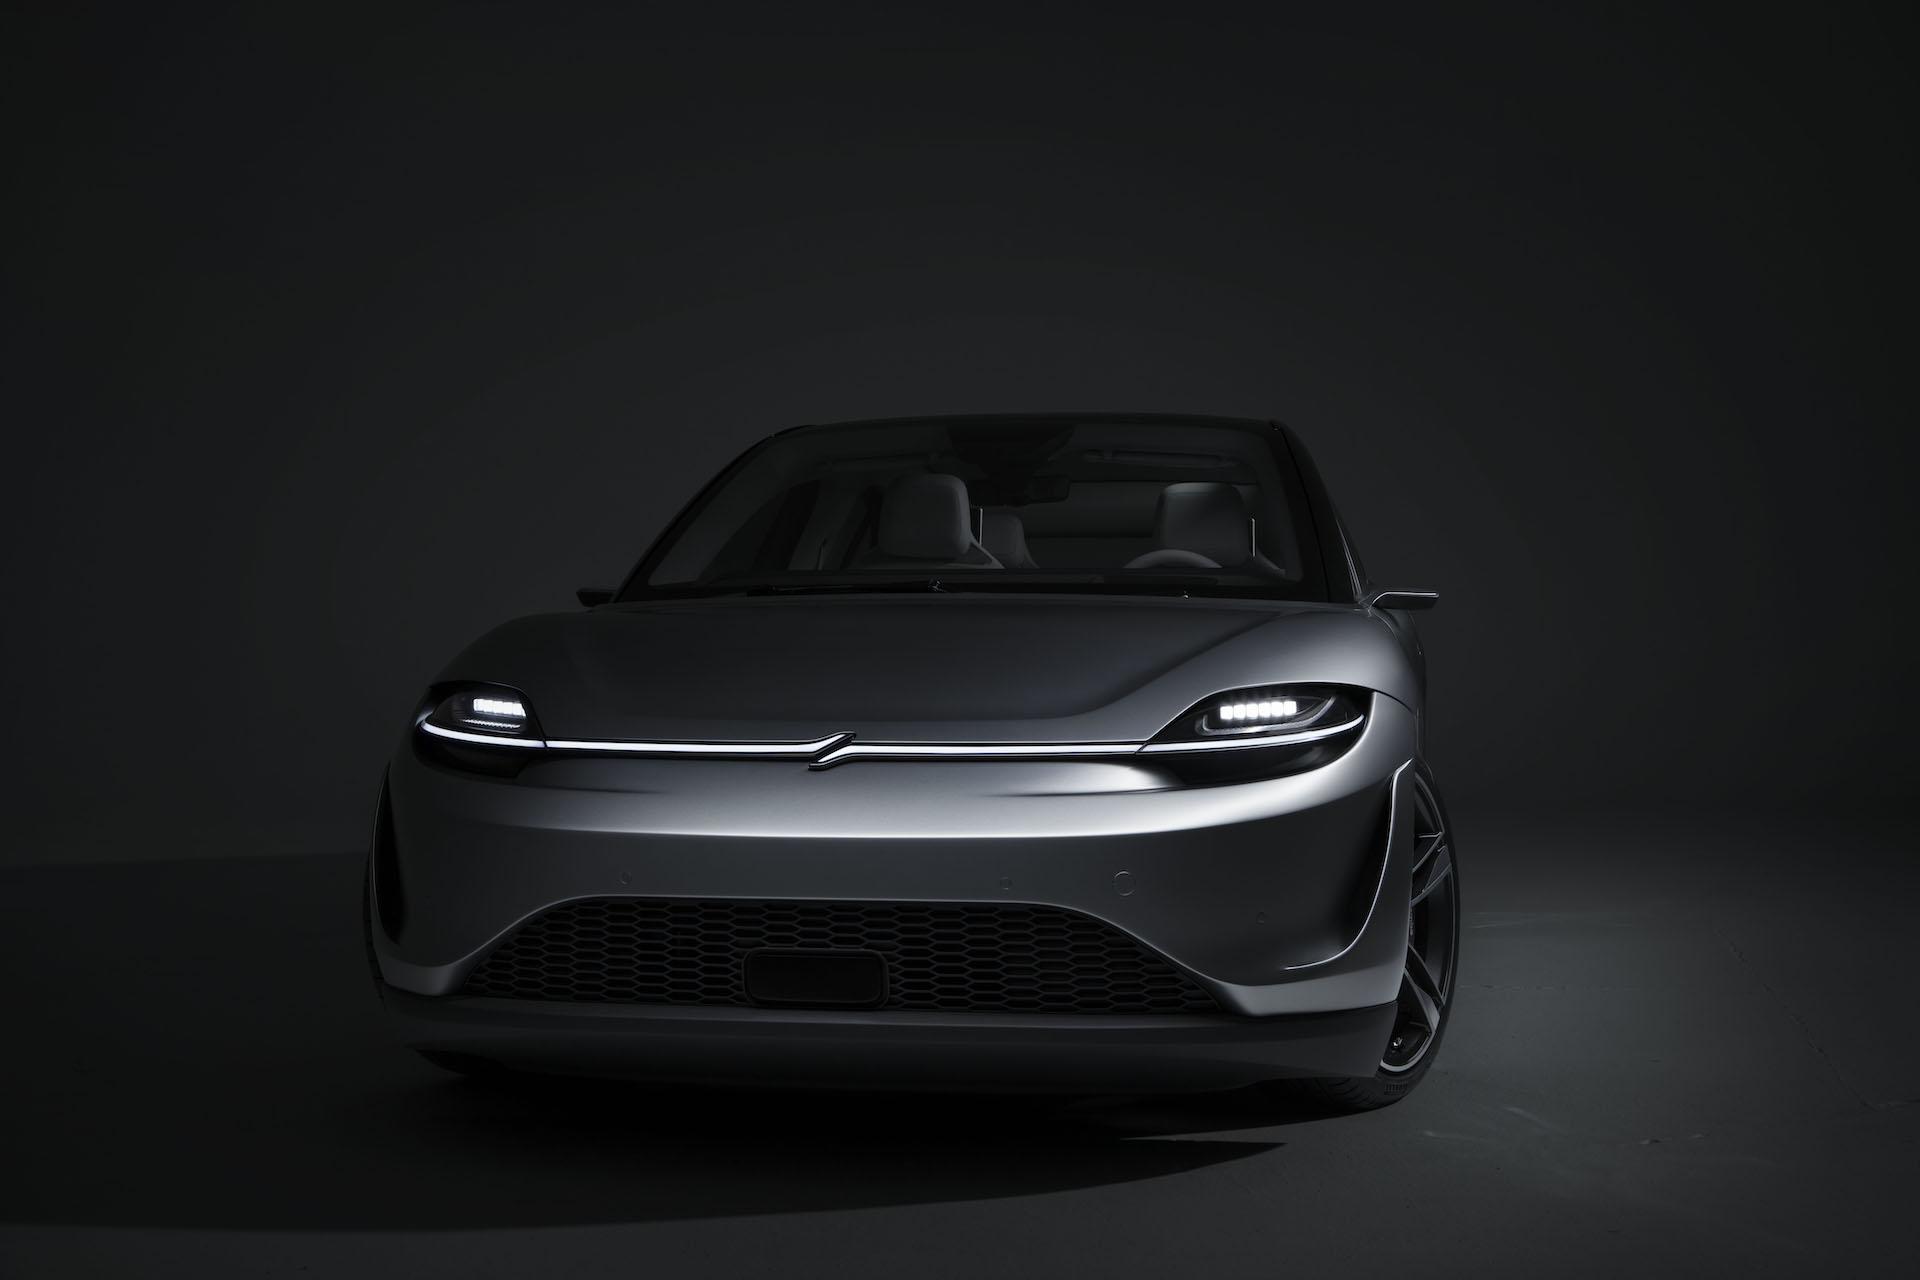 Vision S: Sony präsentiert den Prototypen eines eigenen Elektroautos 1